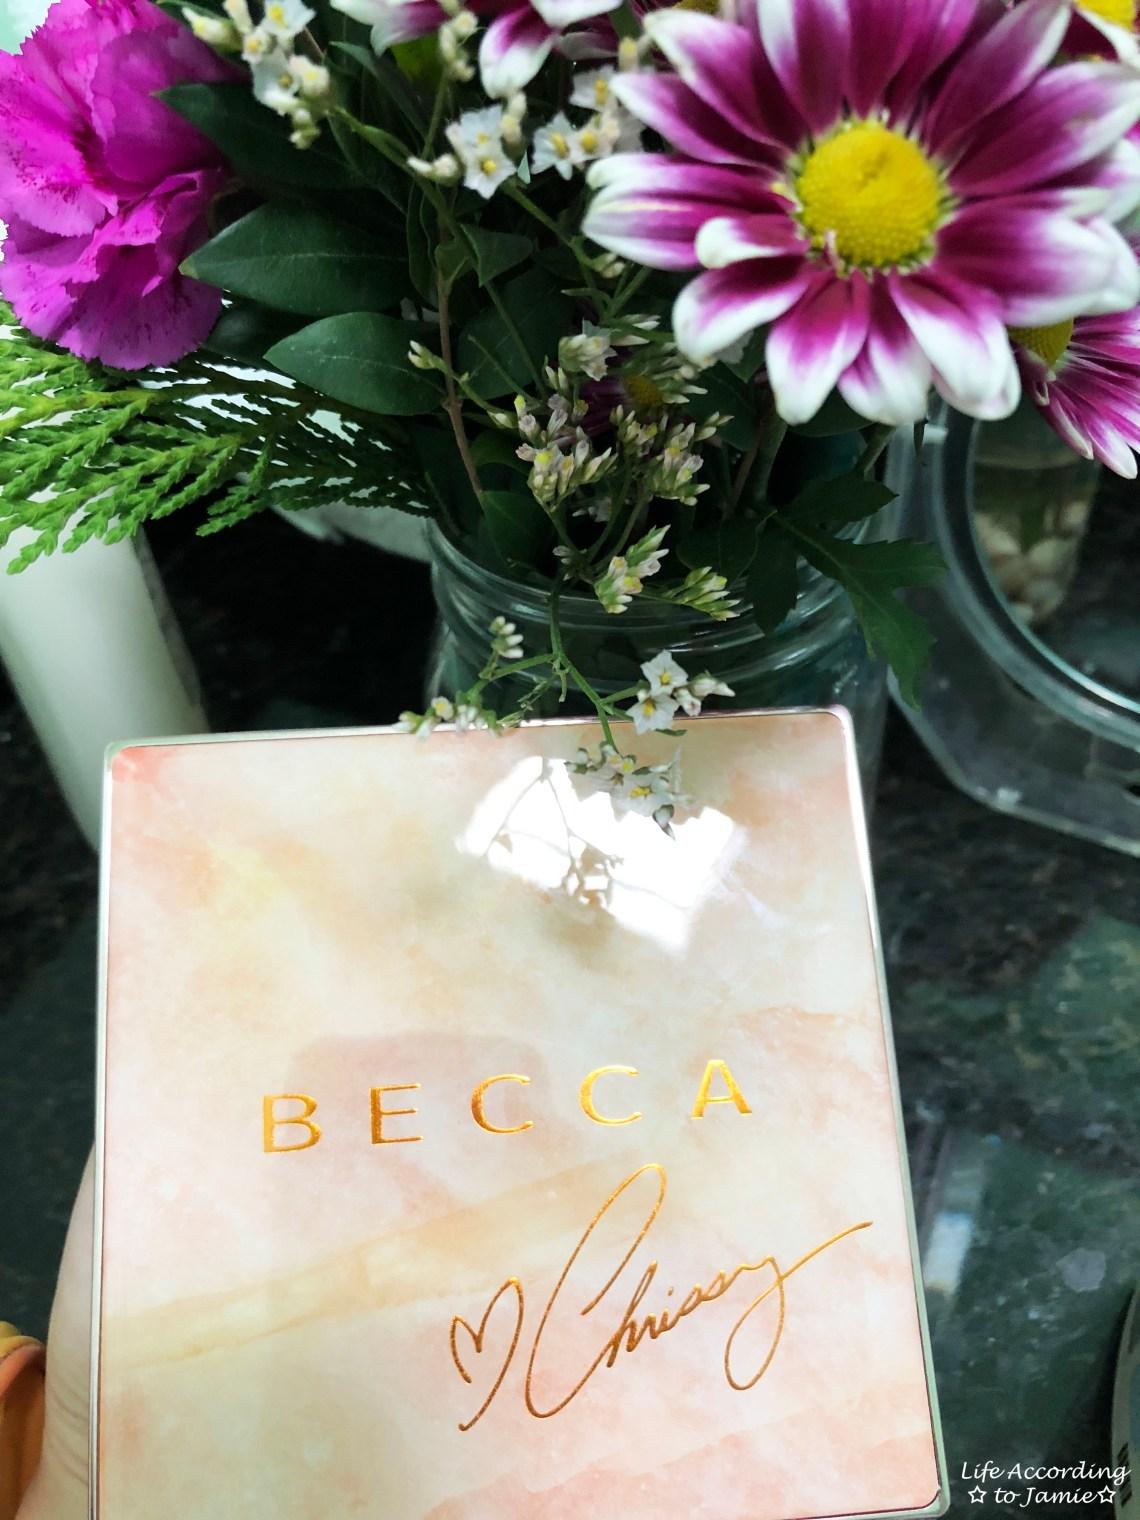 Becca x Chrissy - Glow Face Palette